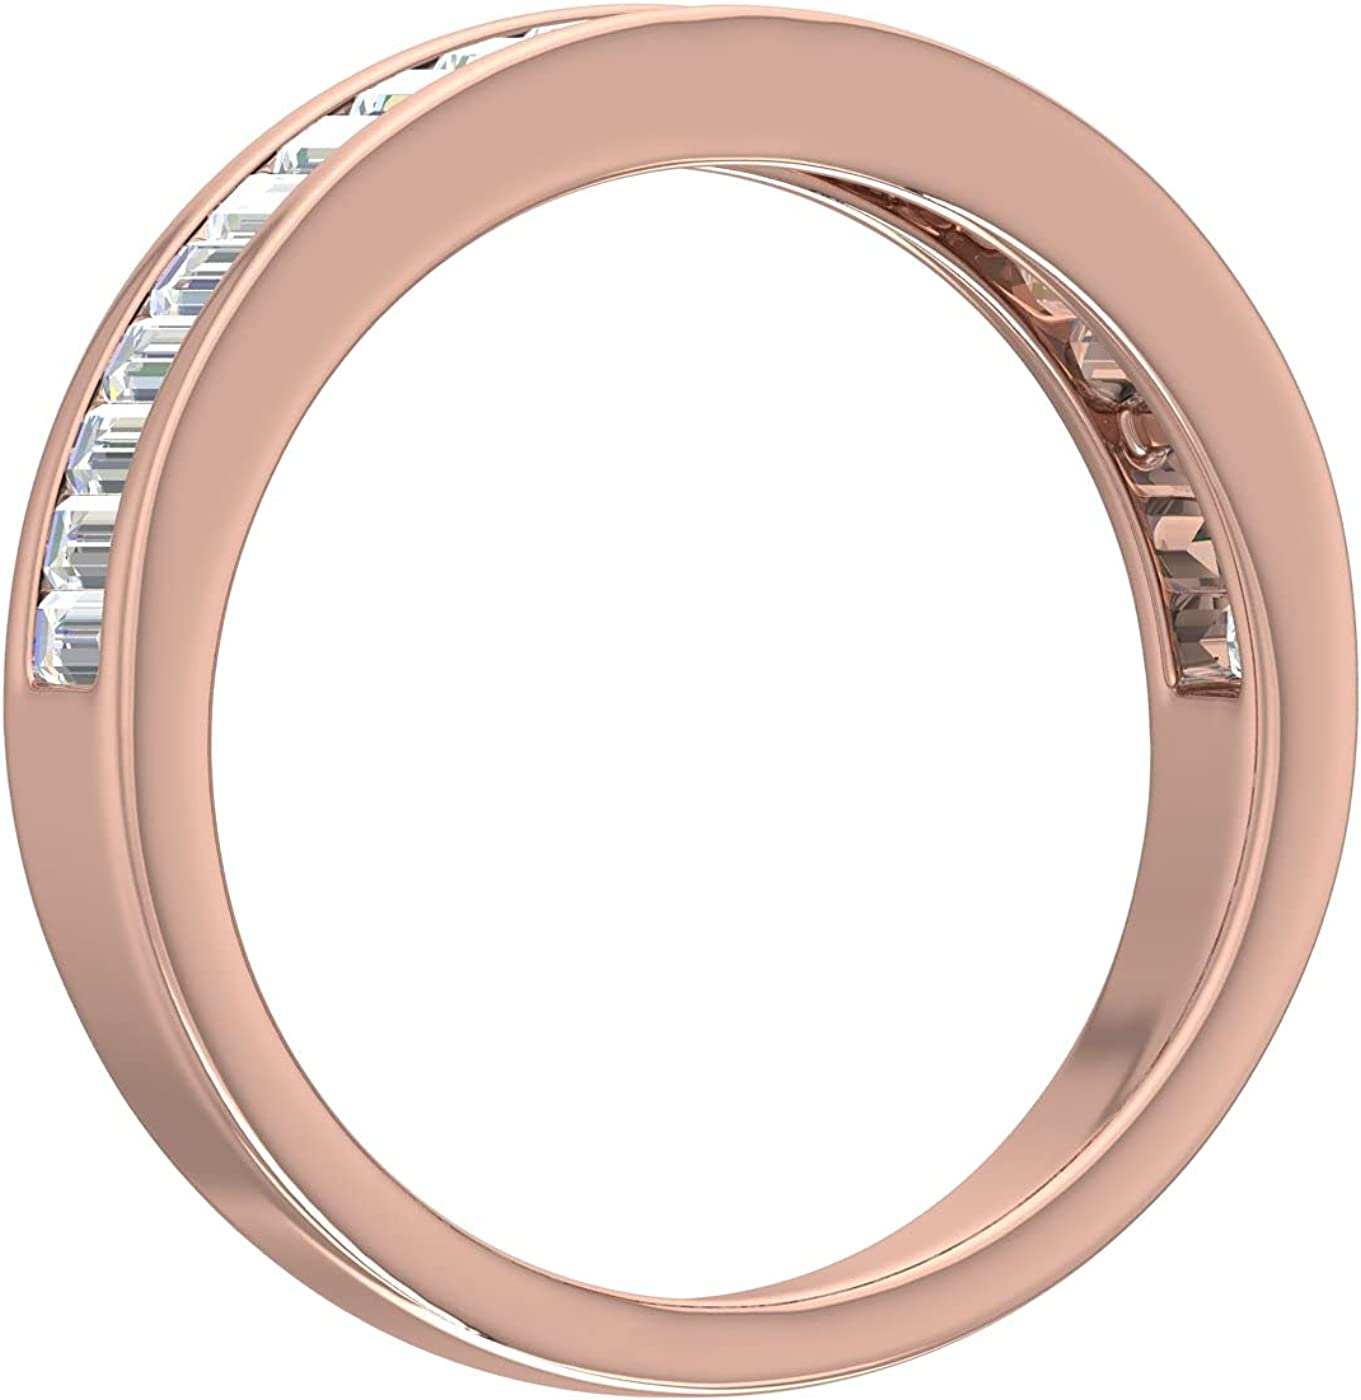 0.55 Carat Channel Set Baguette Shape Diamond Wedding Band Ring in 14K Gold